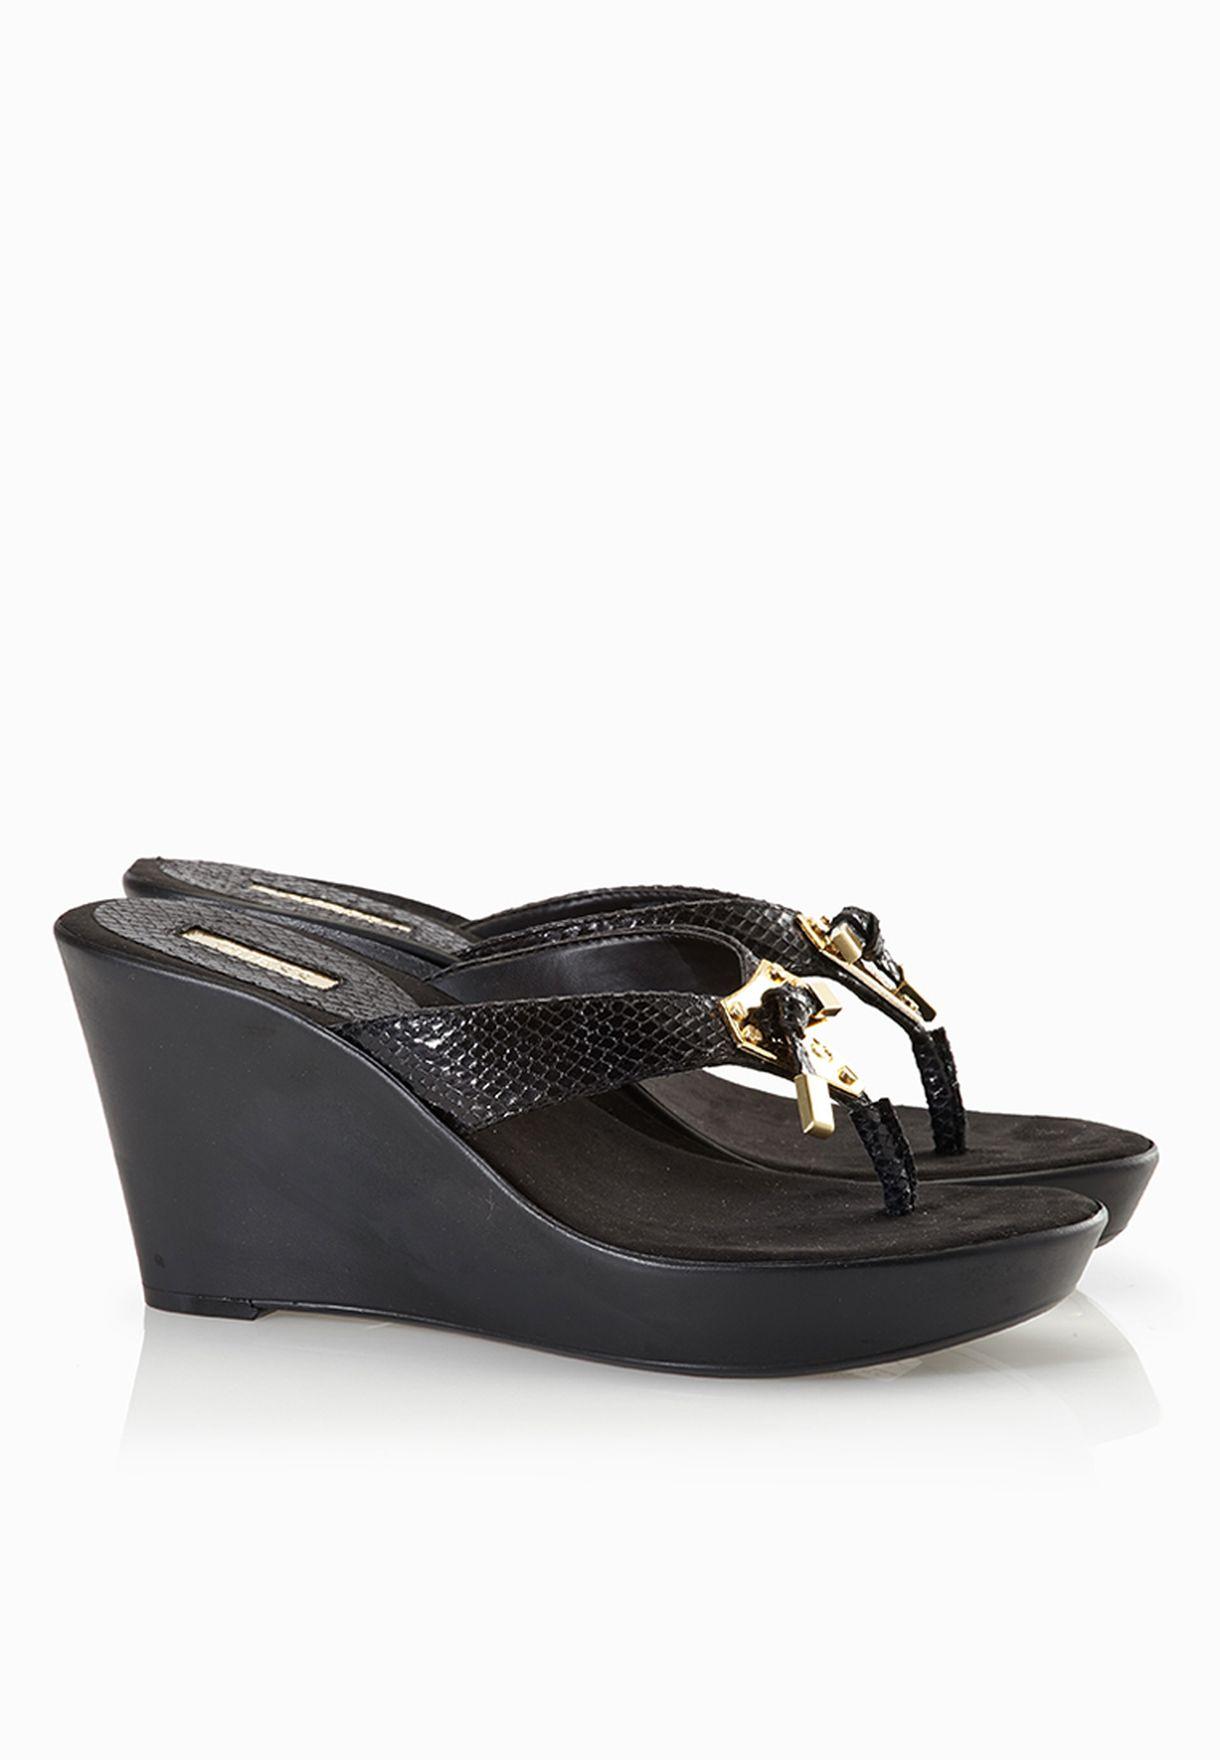 f62c4e742 Shop Guess black Plaque Slide Sandals gwXANDIE-B for Women in UAE ...